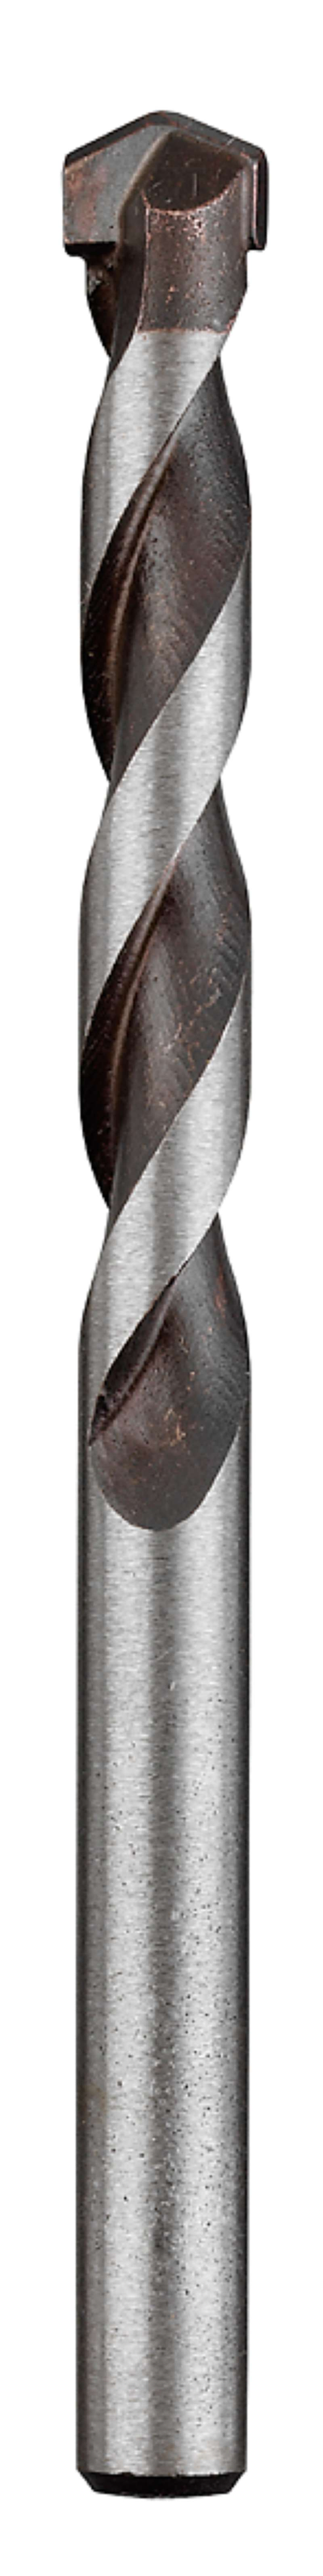 Сверло по камню Kwb 044-568 сверло по камню kwb 044 700